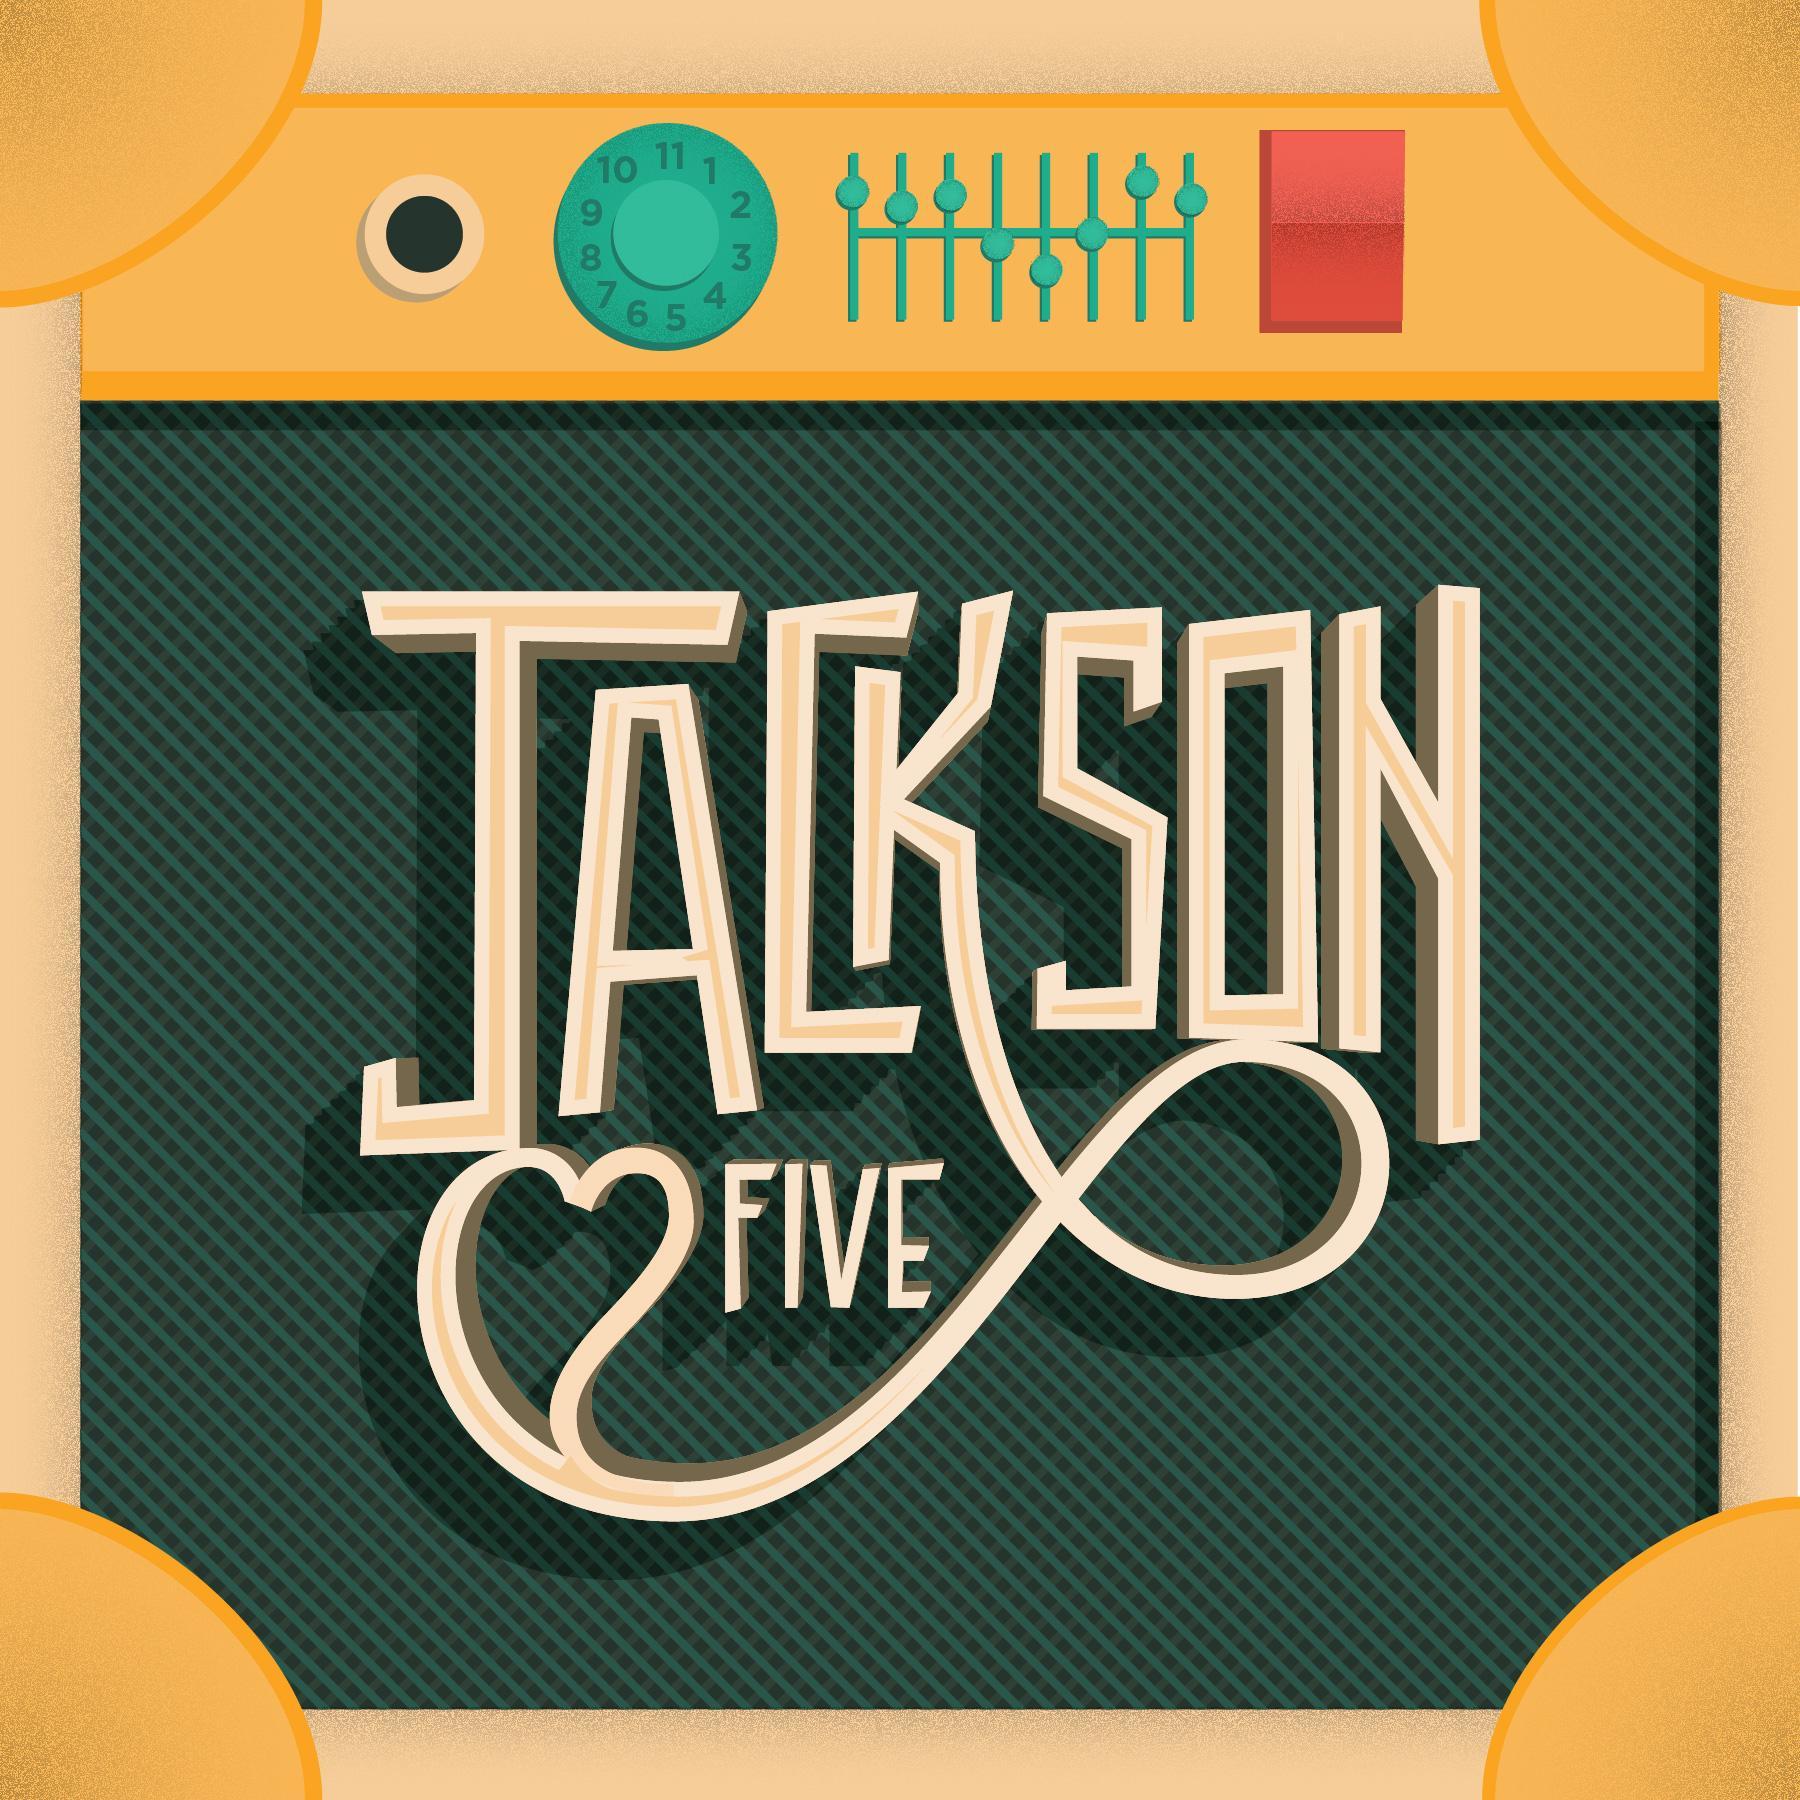 Jackson 5 / logo reinterpretation  & Tom Petty - Stand Your Ground    - image 6 - student project